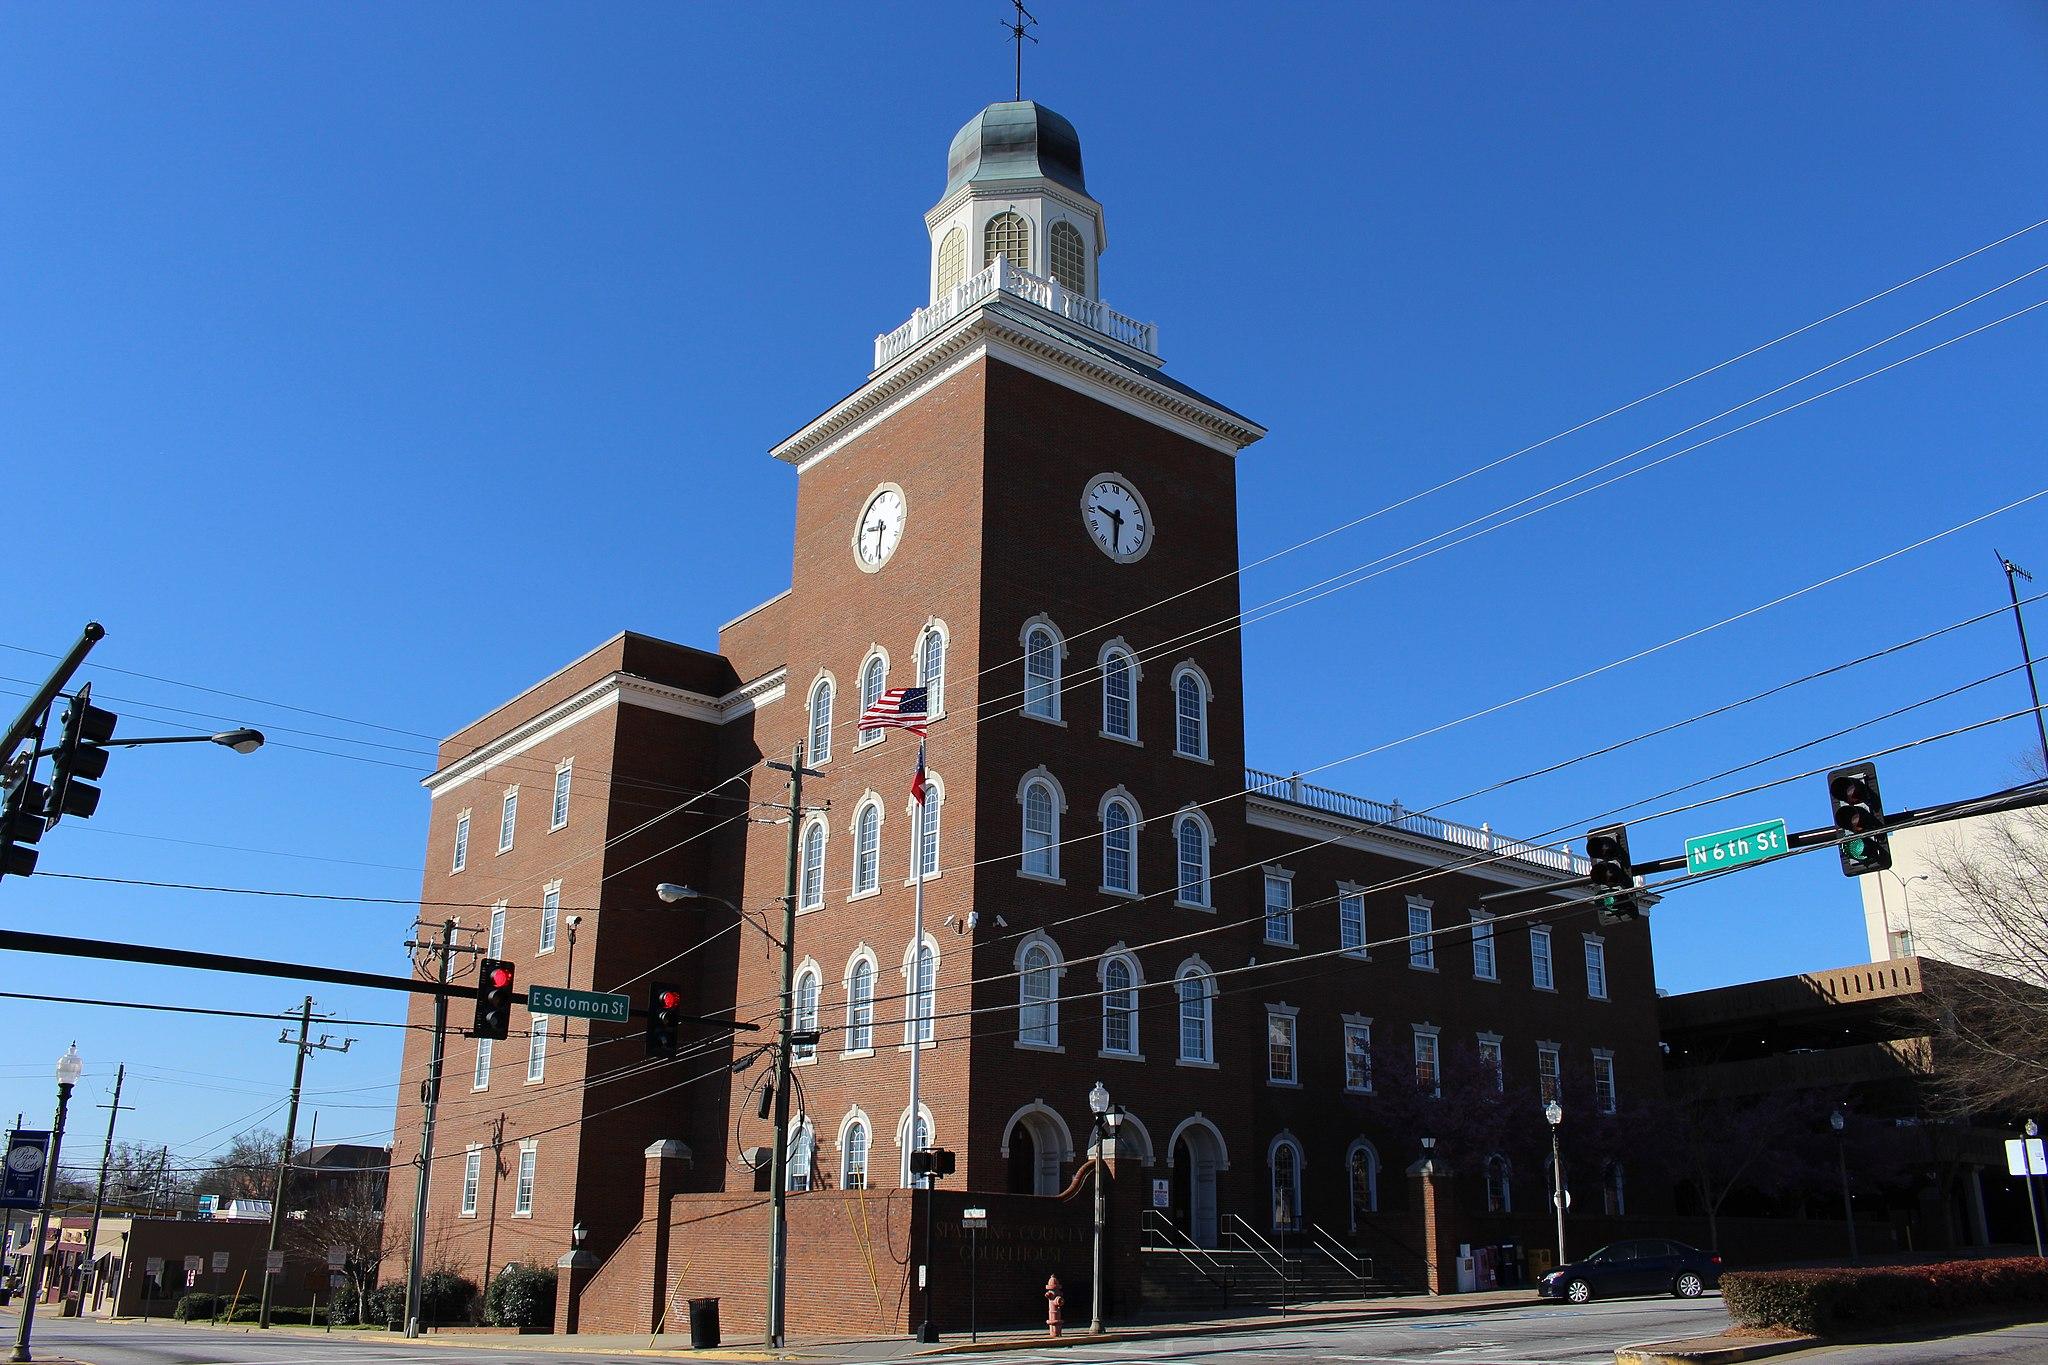 Spalding County Courthouse (NE corner)